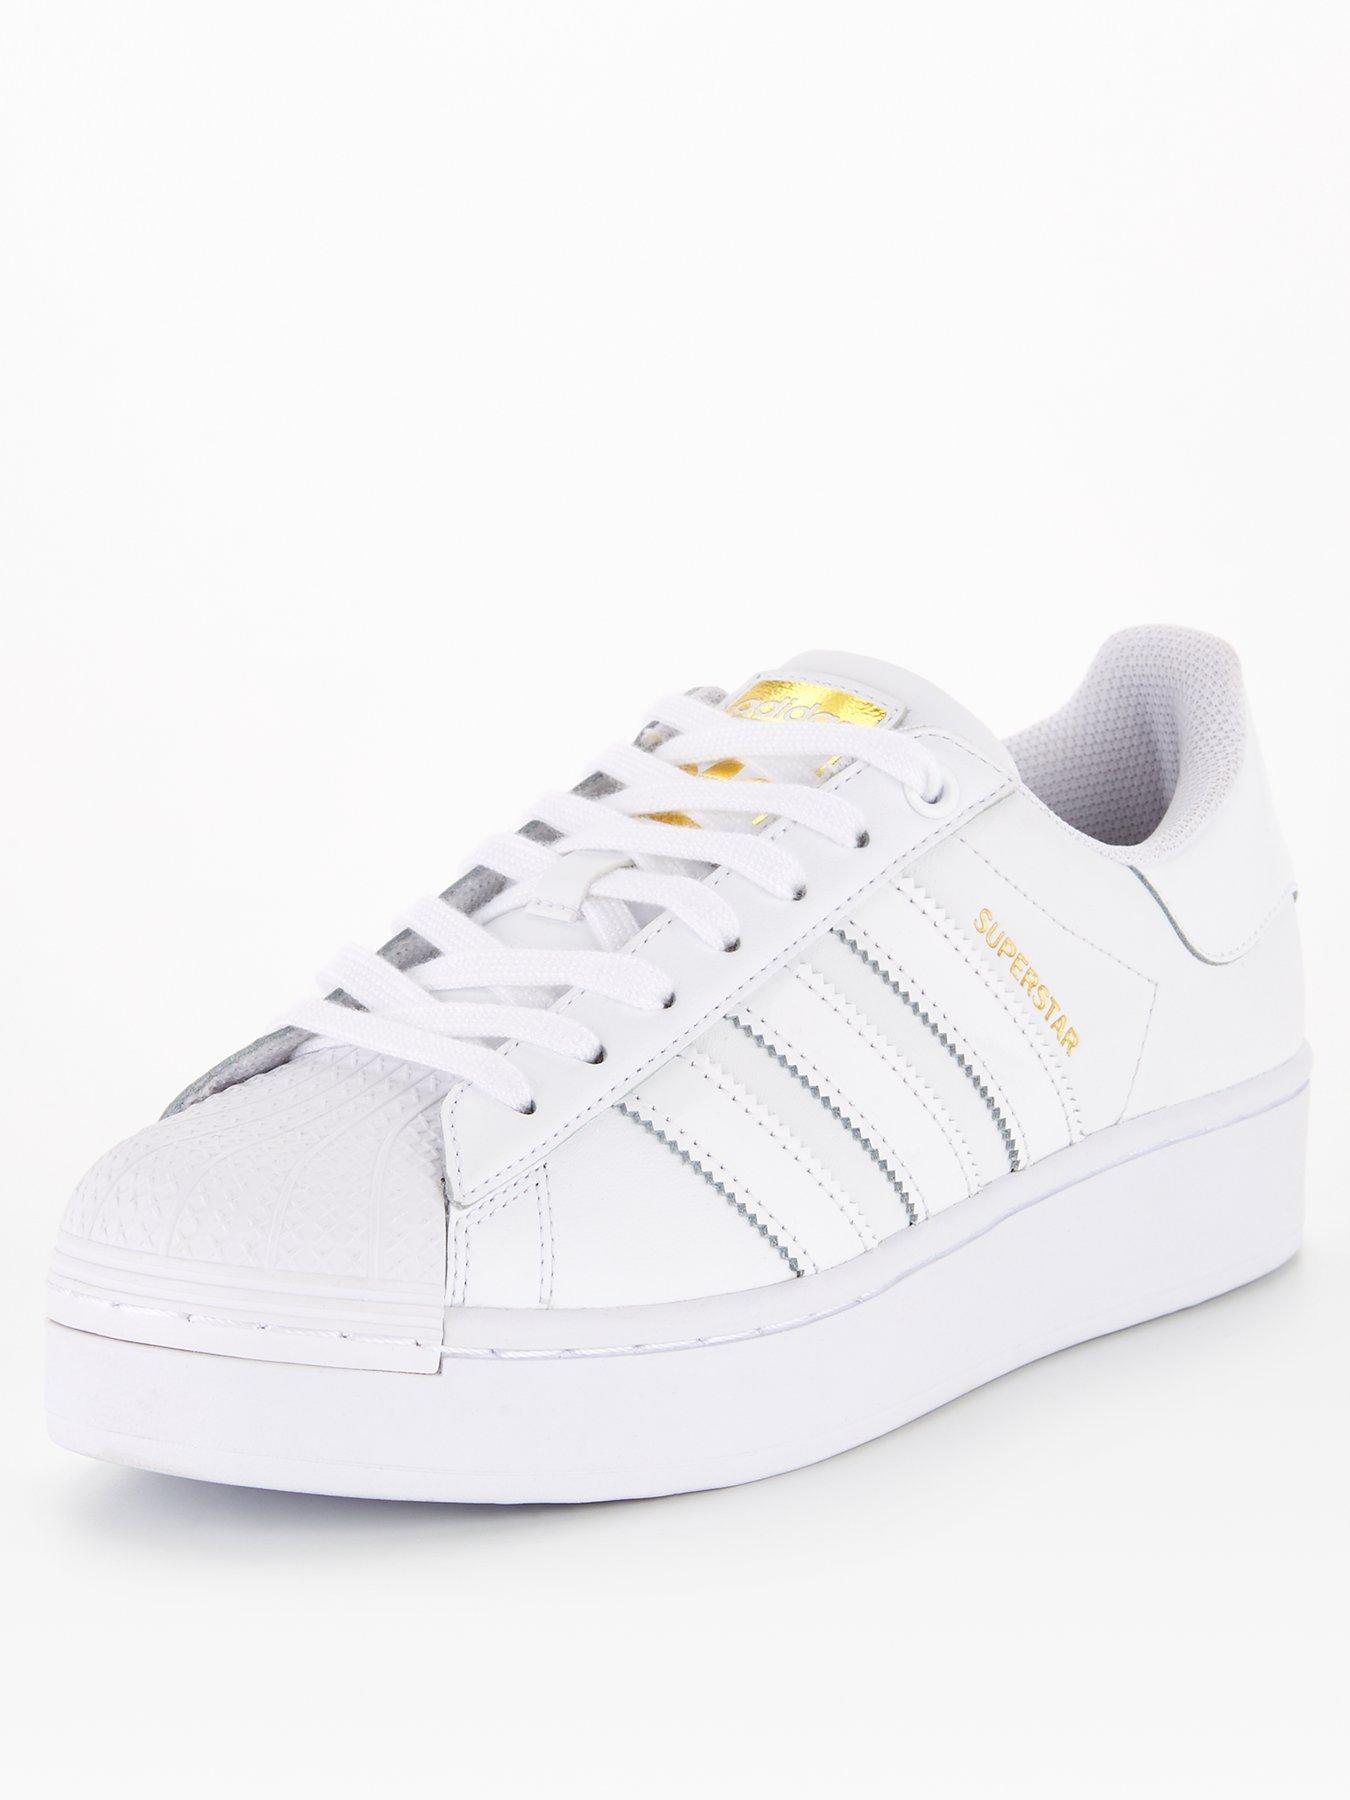 adidas Originals Superstar | Adidas | Trainers | Women | www ...